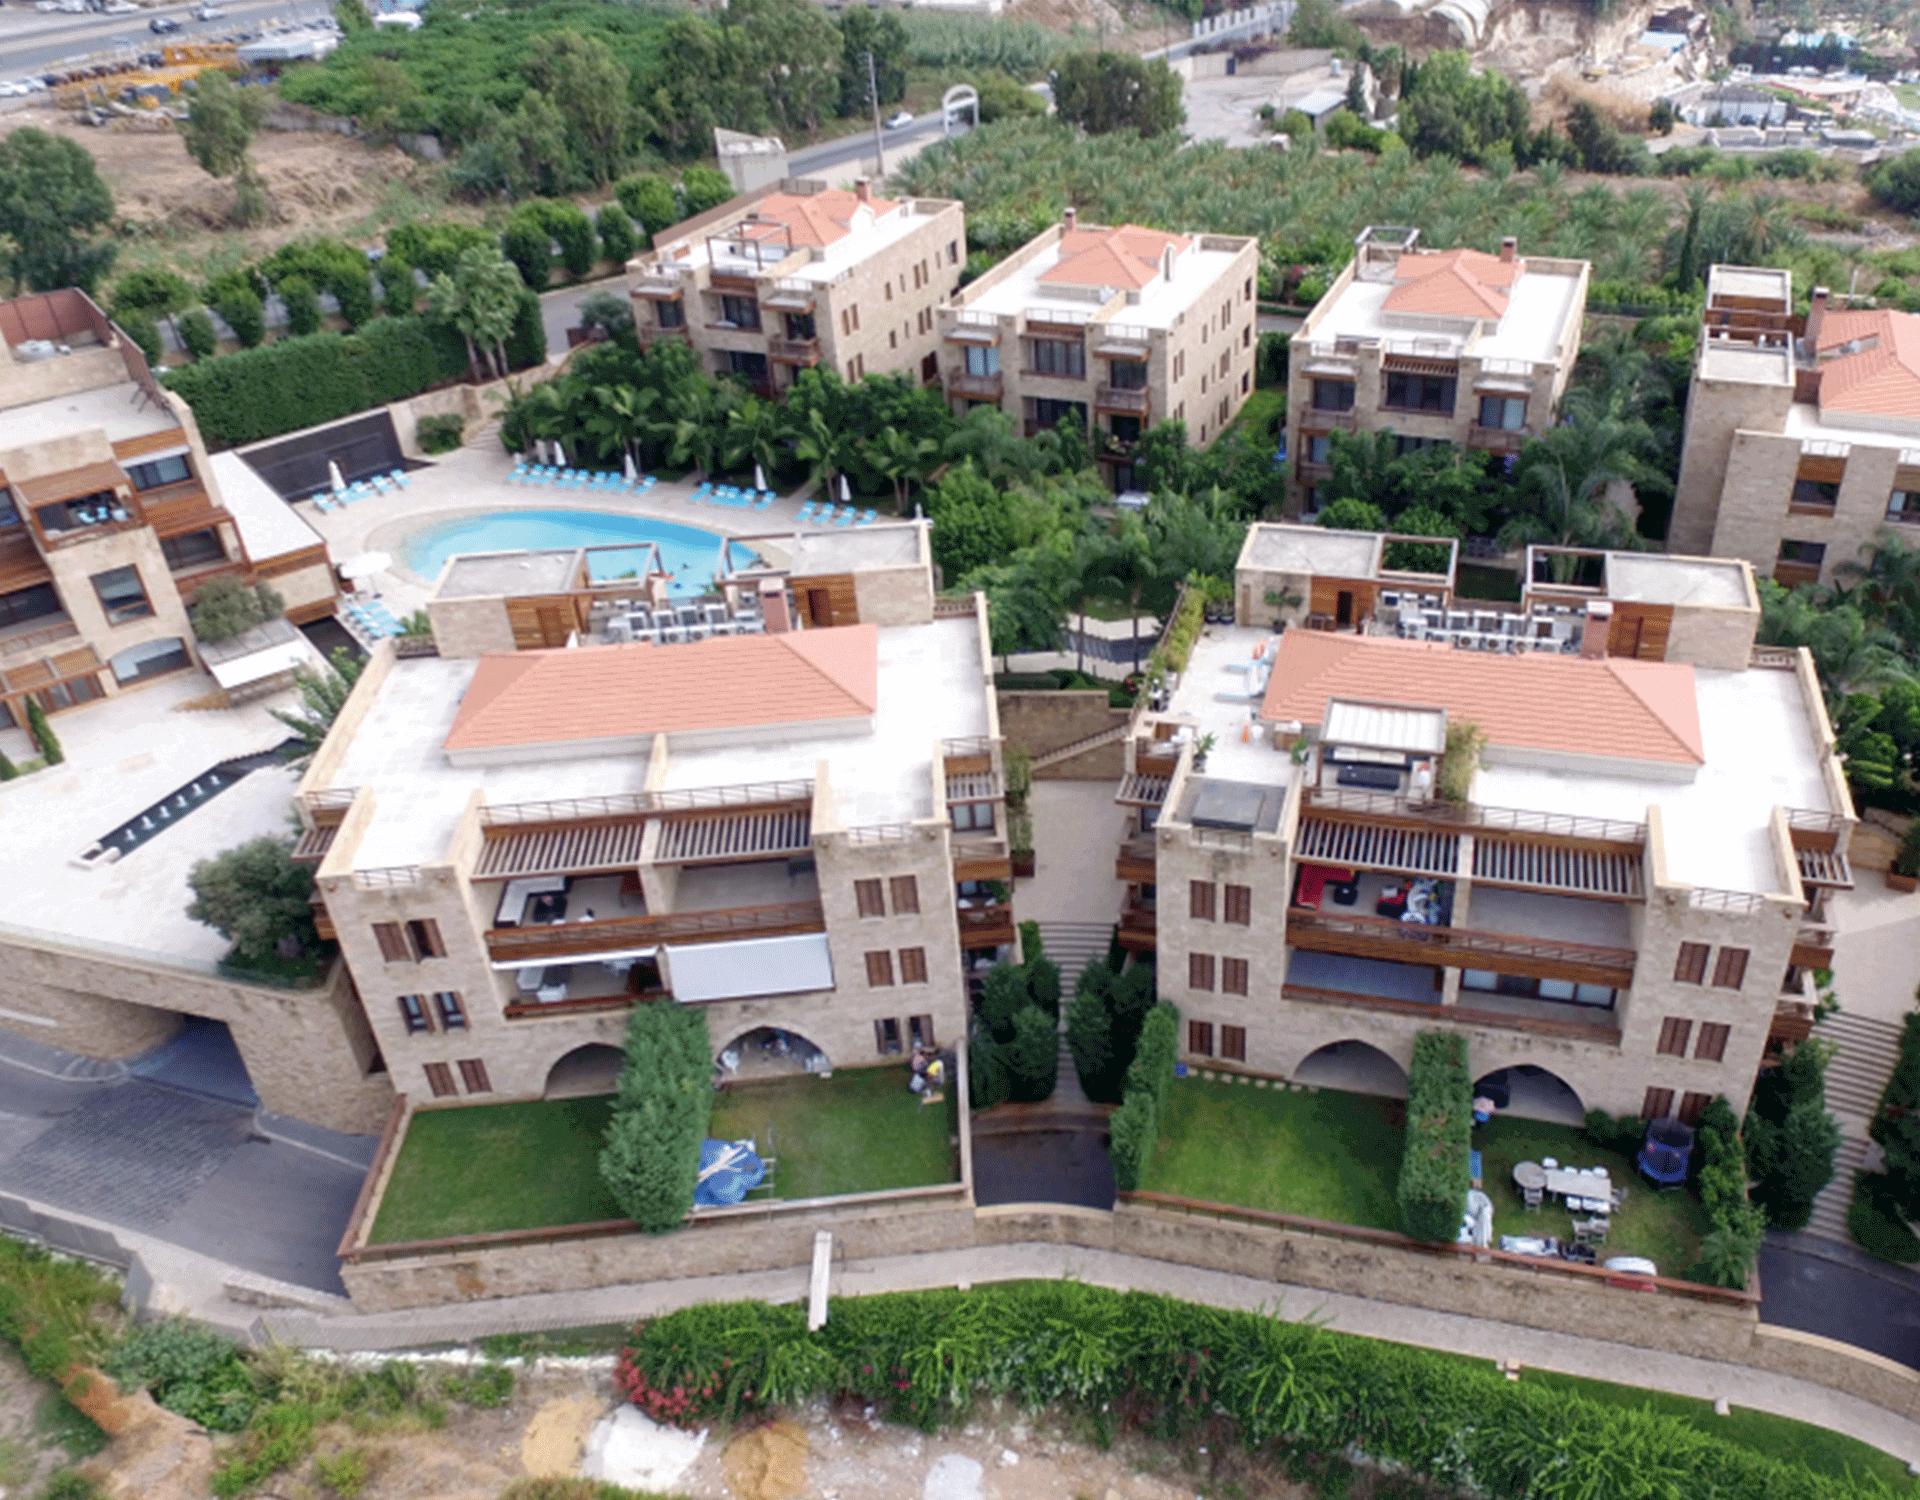 BYBLOS BEACH VILLA PROJECT BYBLOS LEBANON